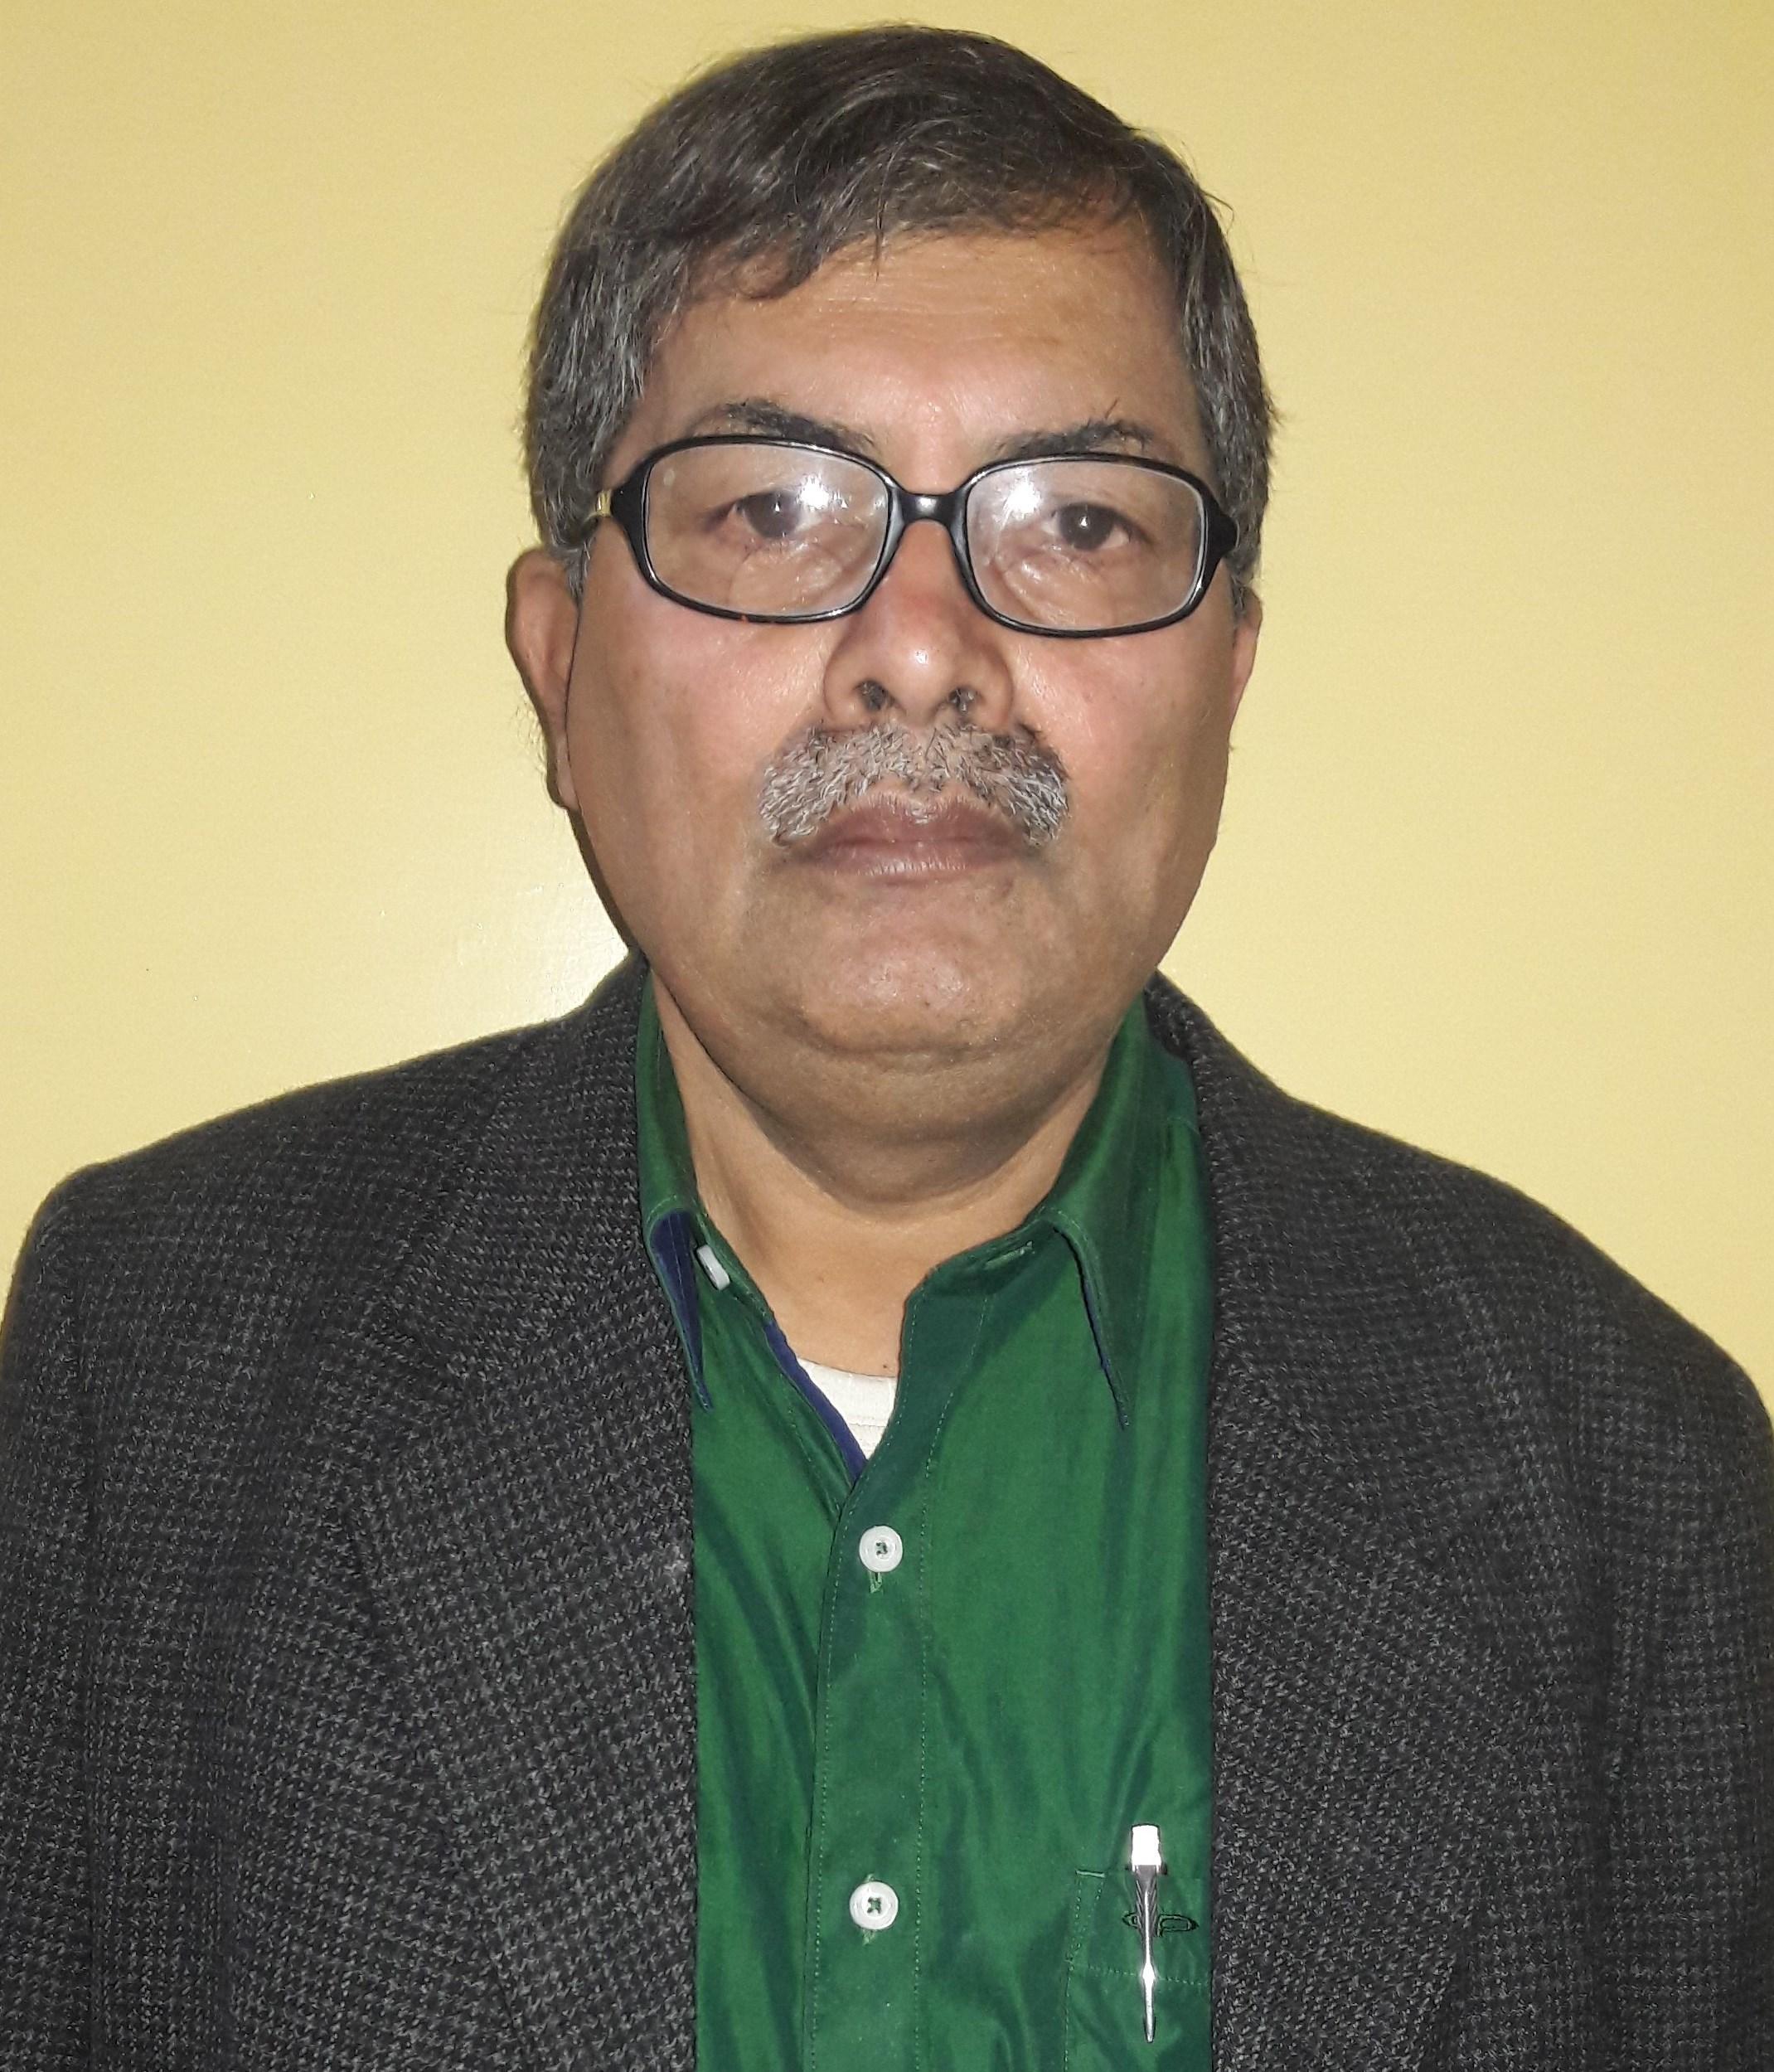 vijay singh bursar